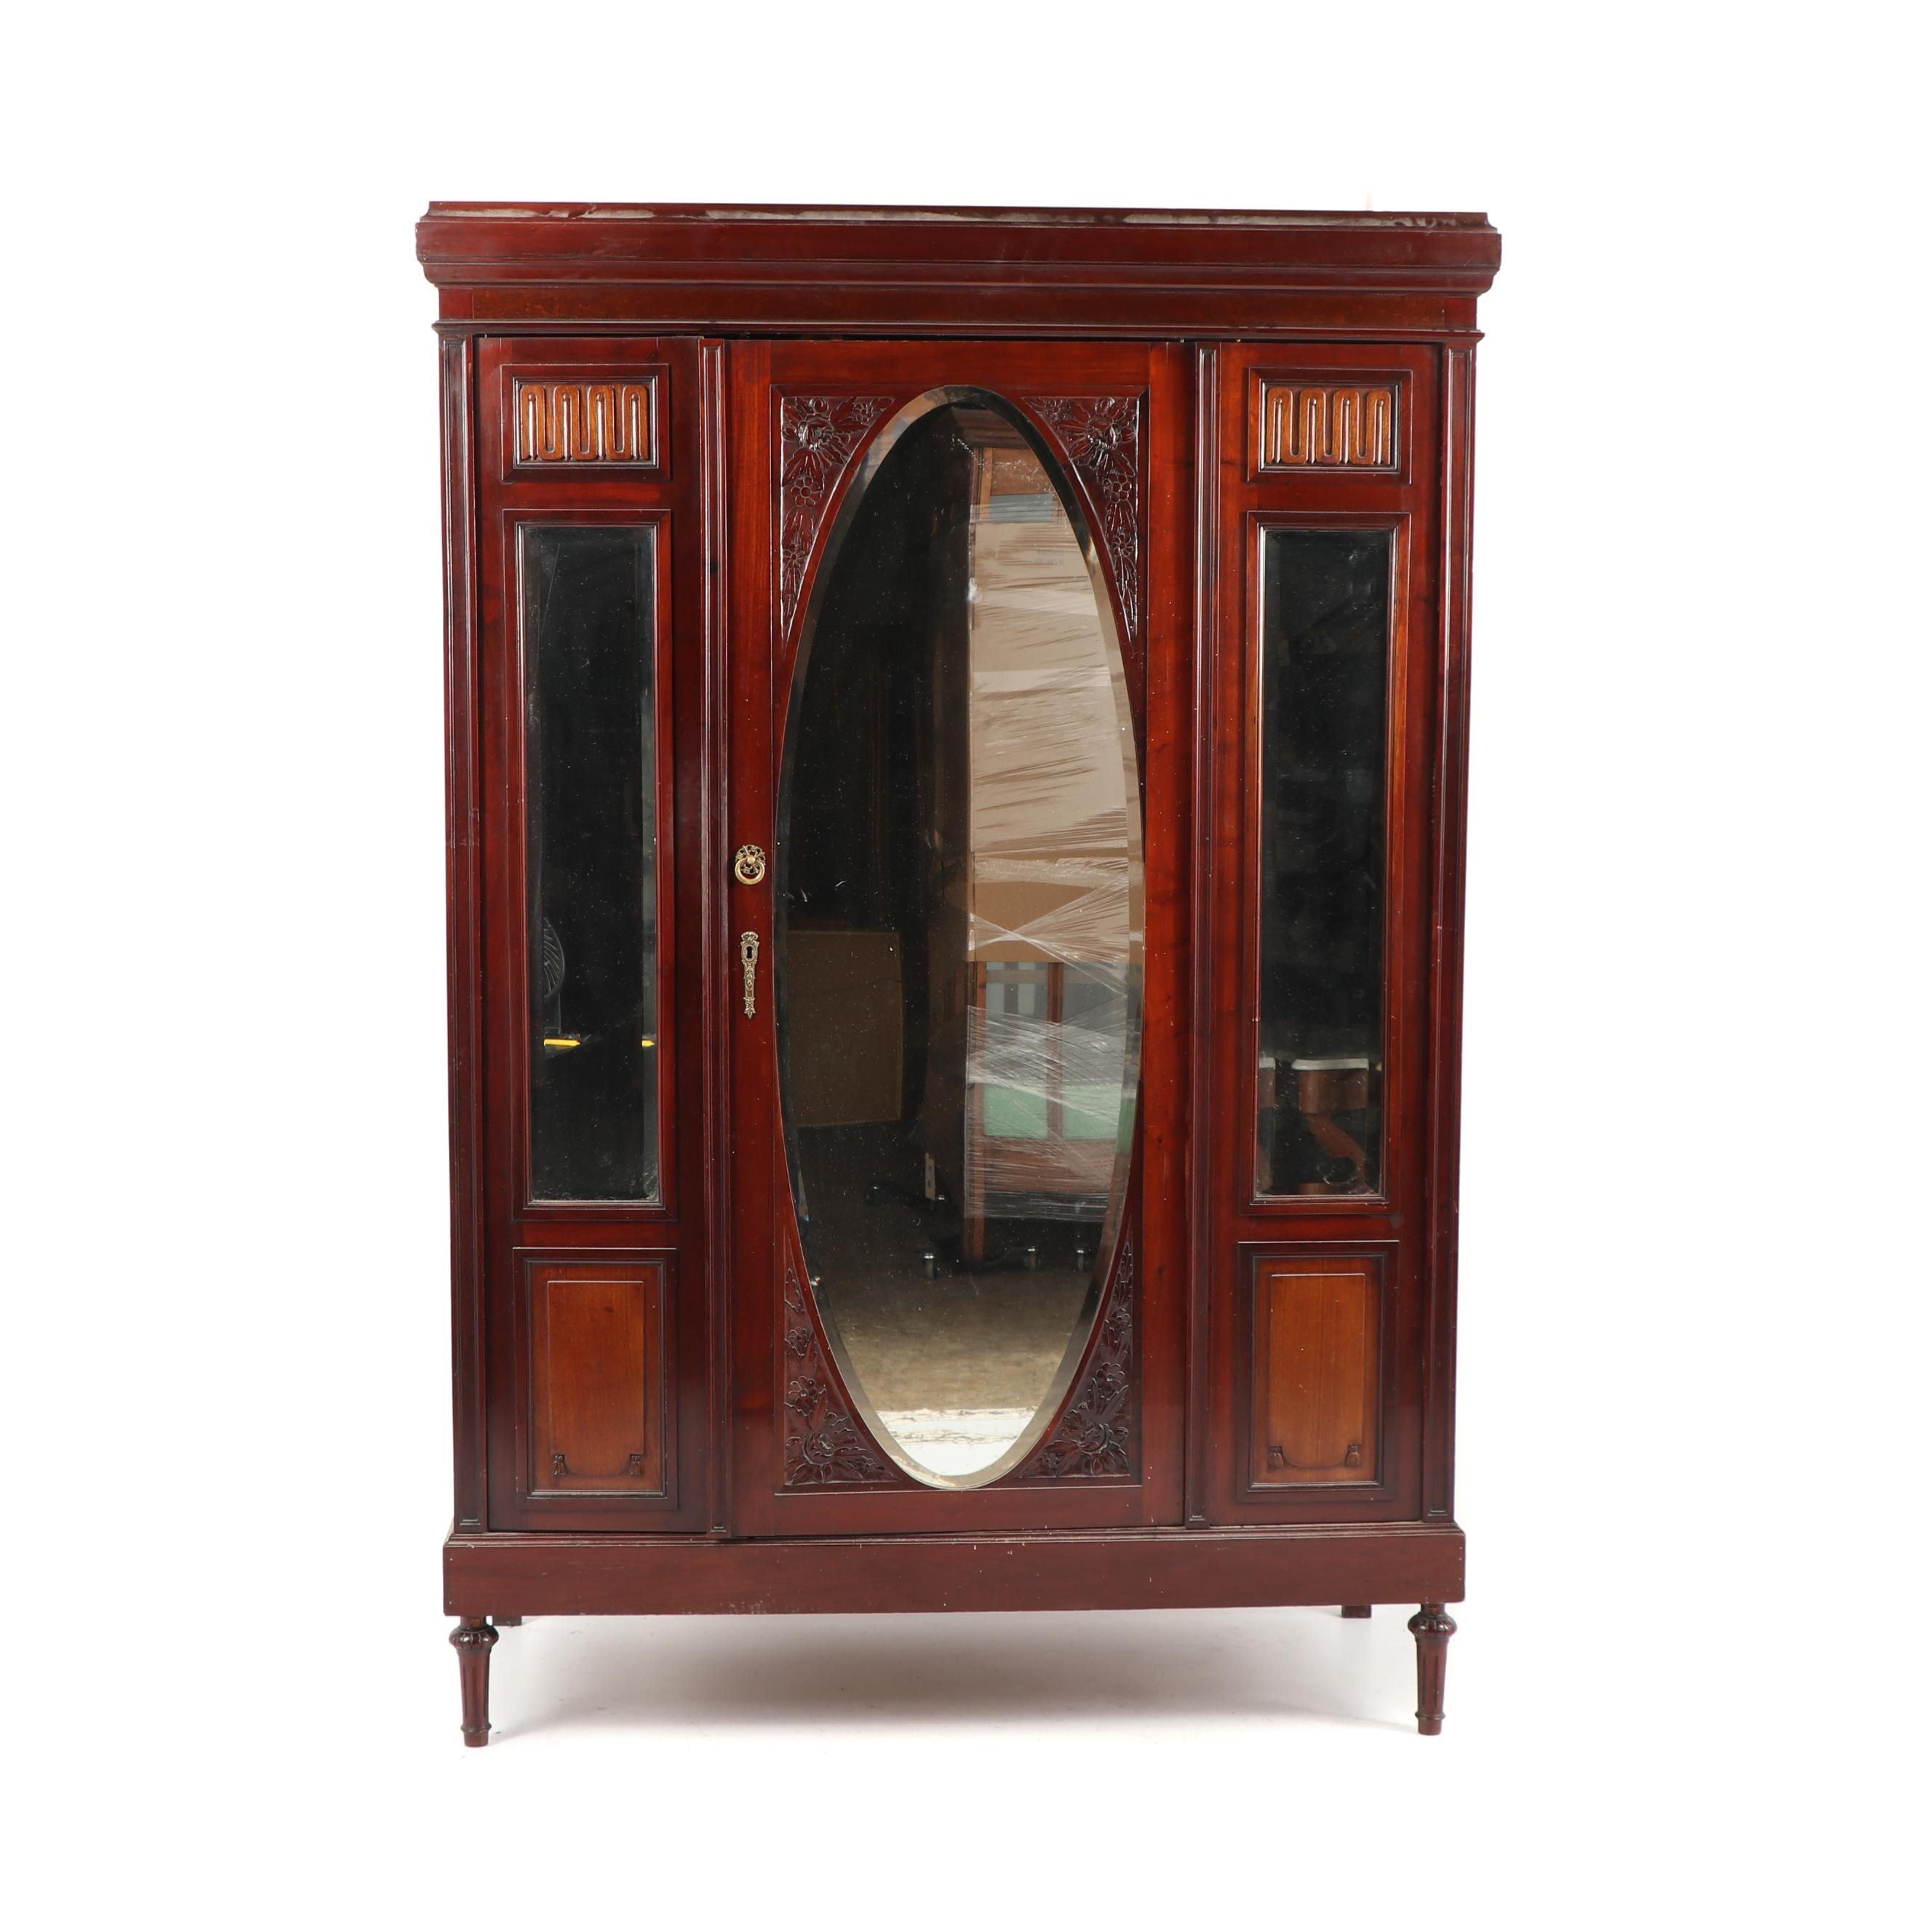 Cherry Wardrobe with Beveled Mirror Doors